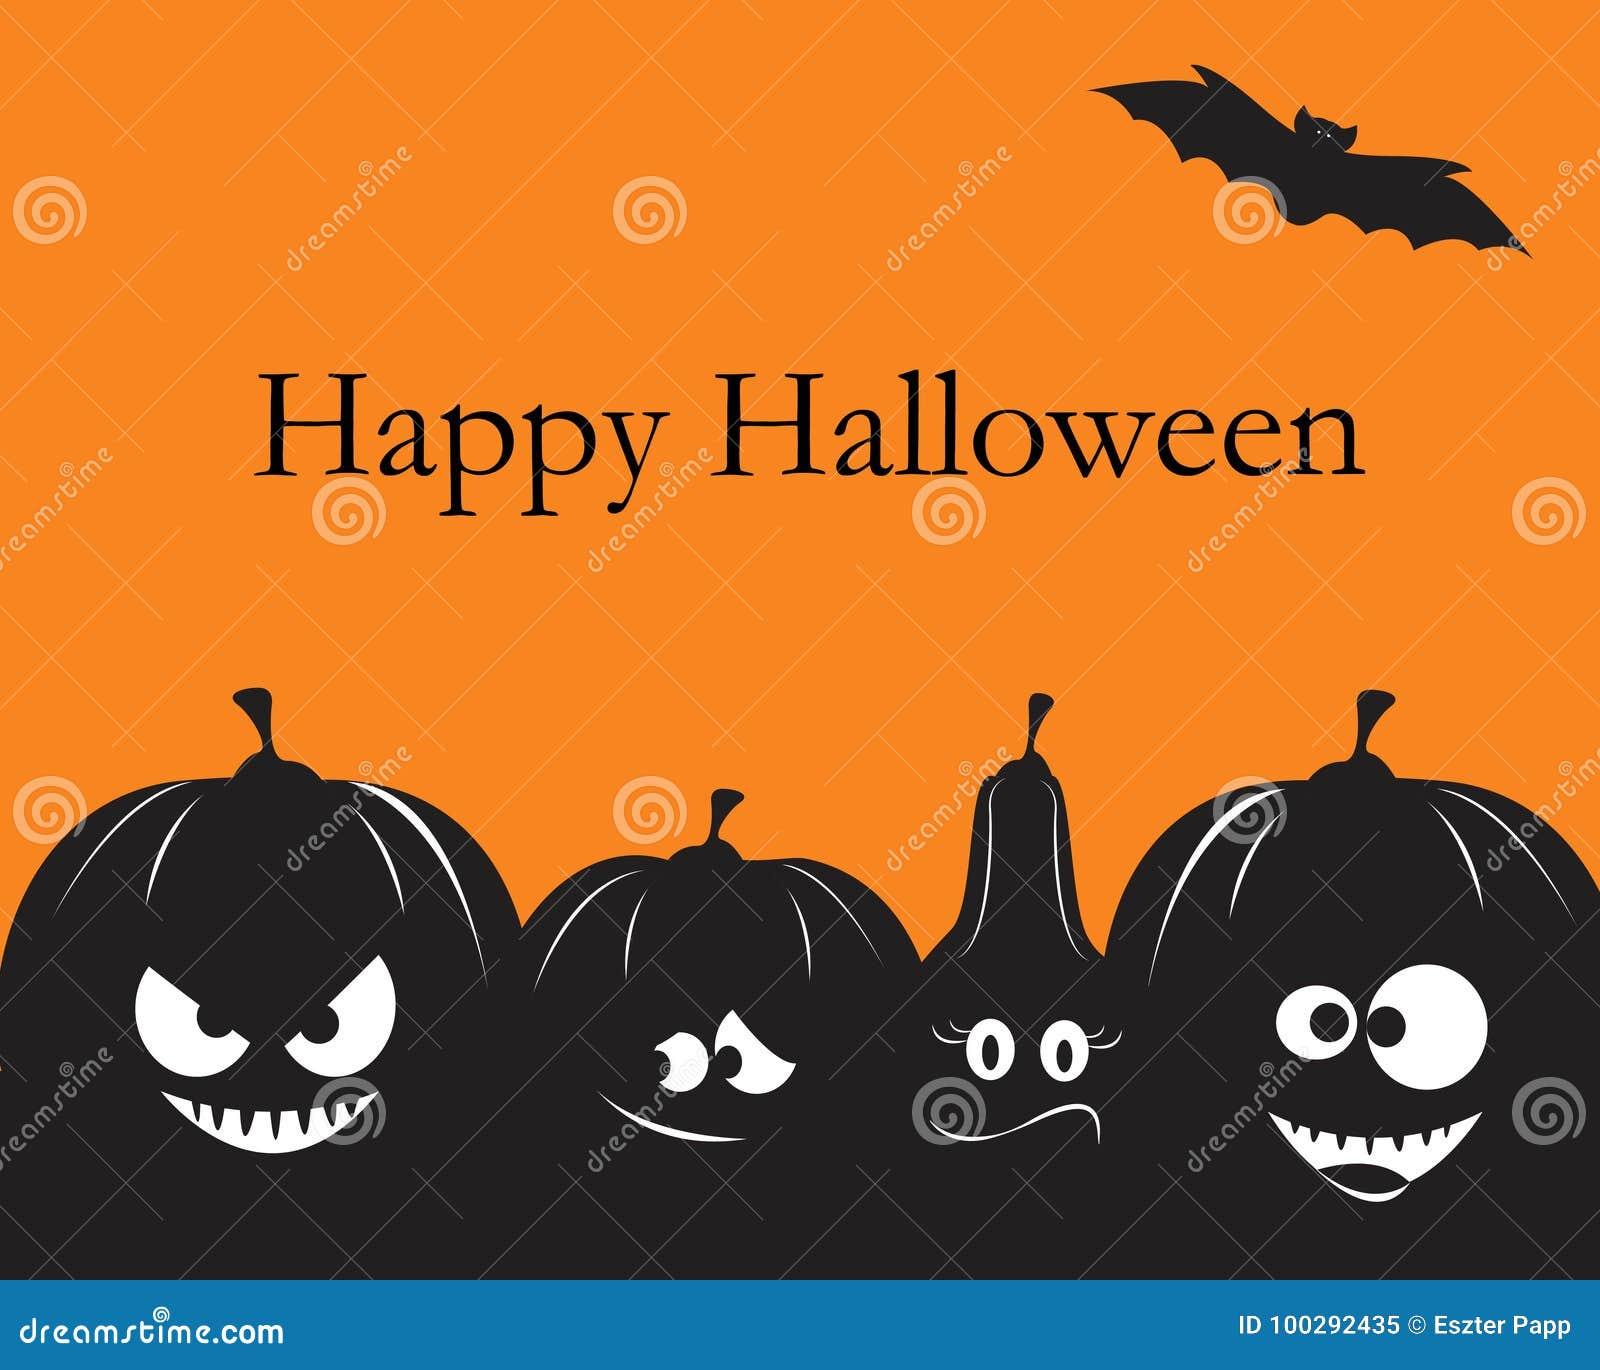 funny halloween pumpkins stock vector. illustration of creepy